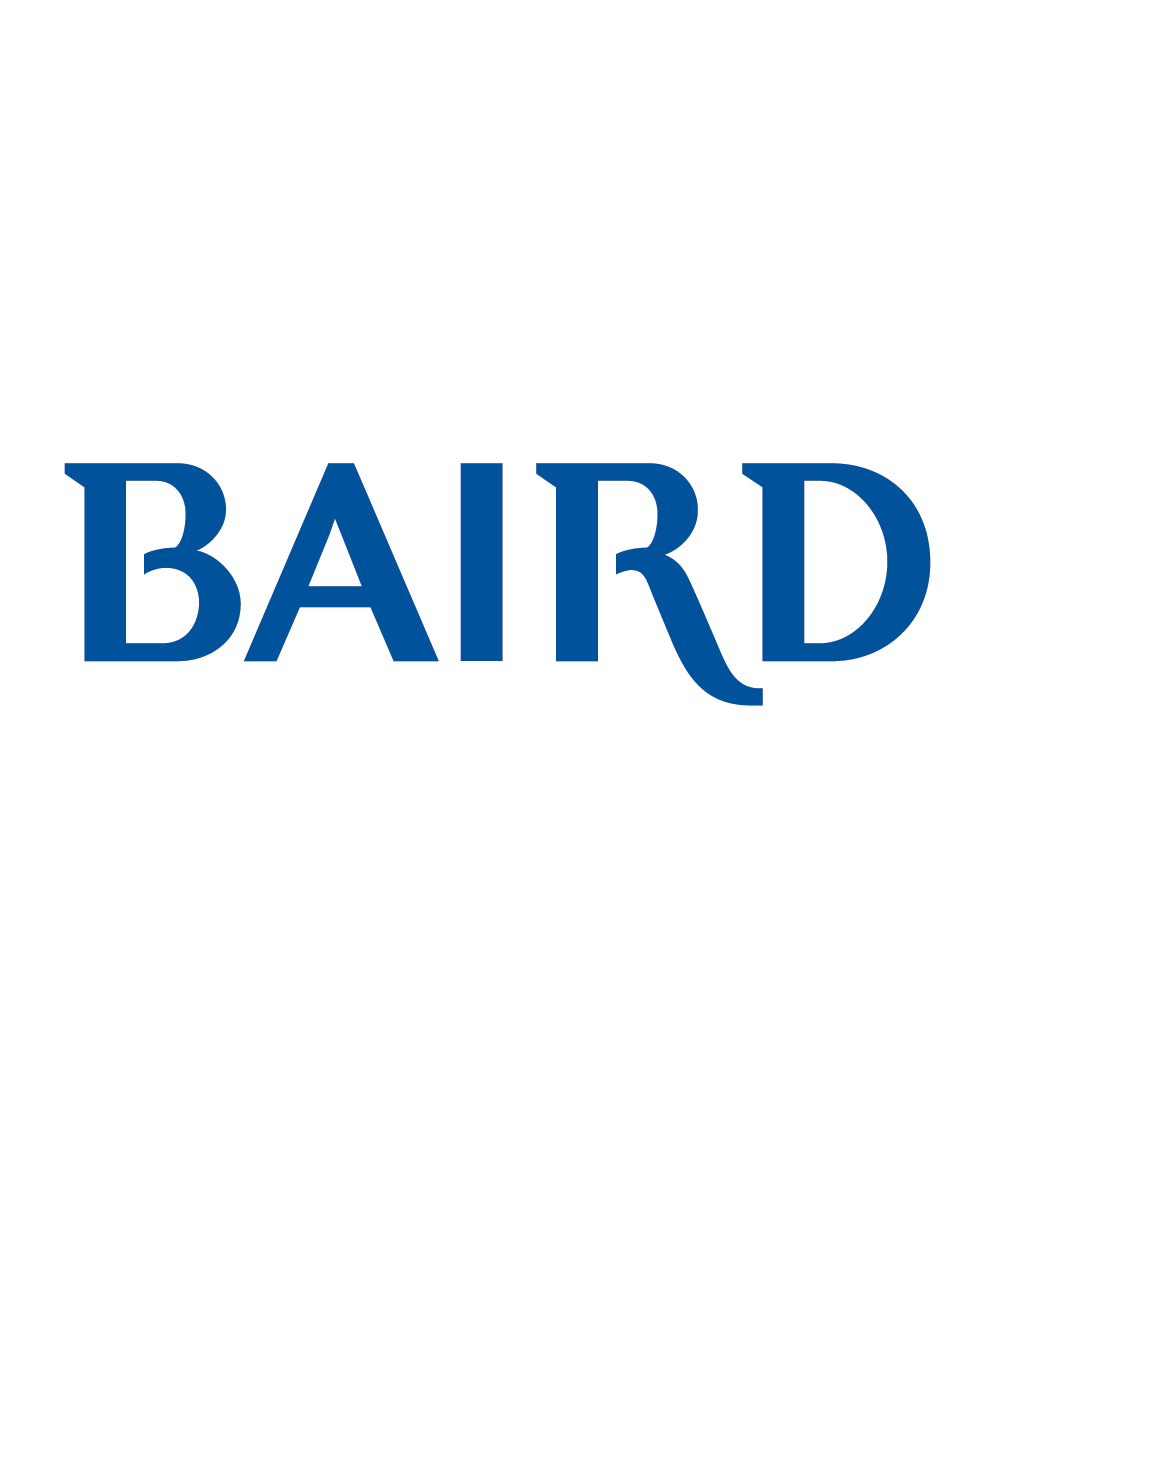 Baird_PWM_v_WHT.png